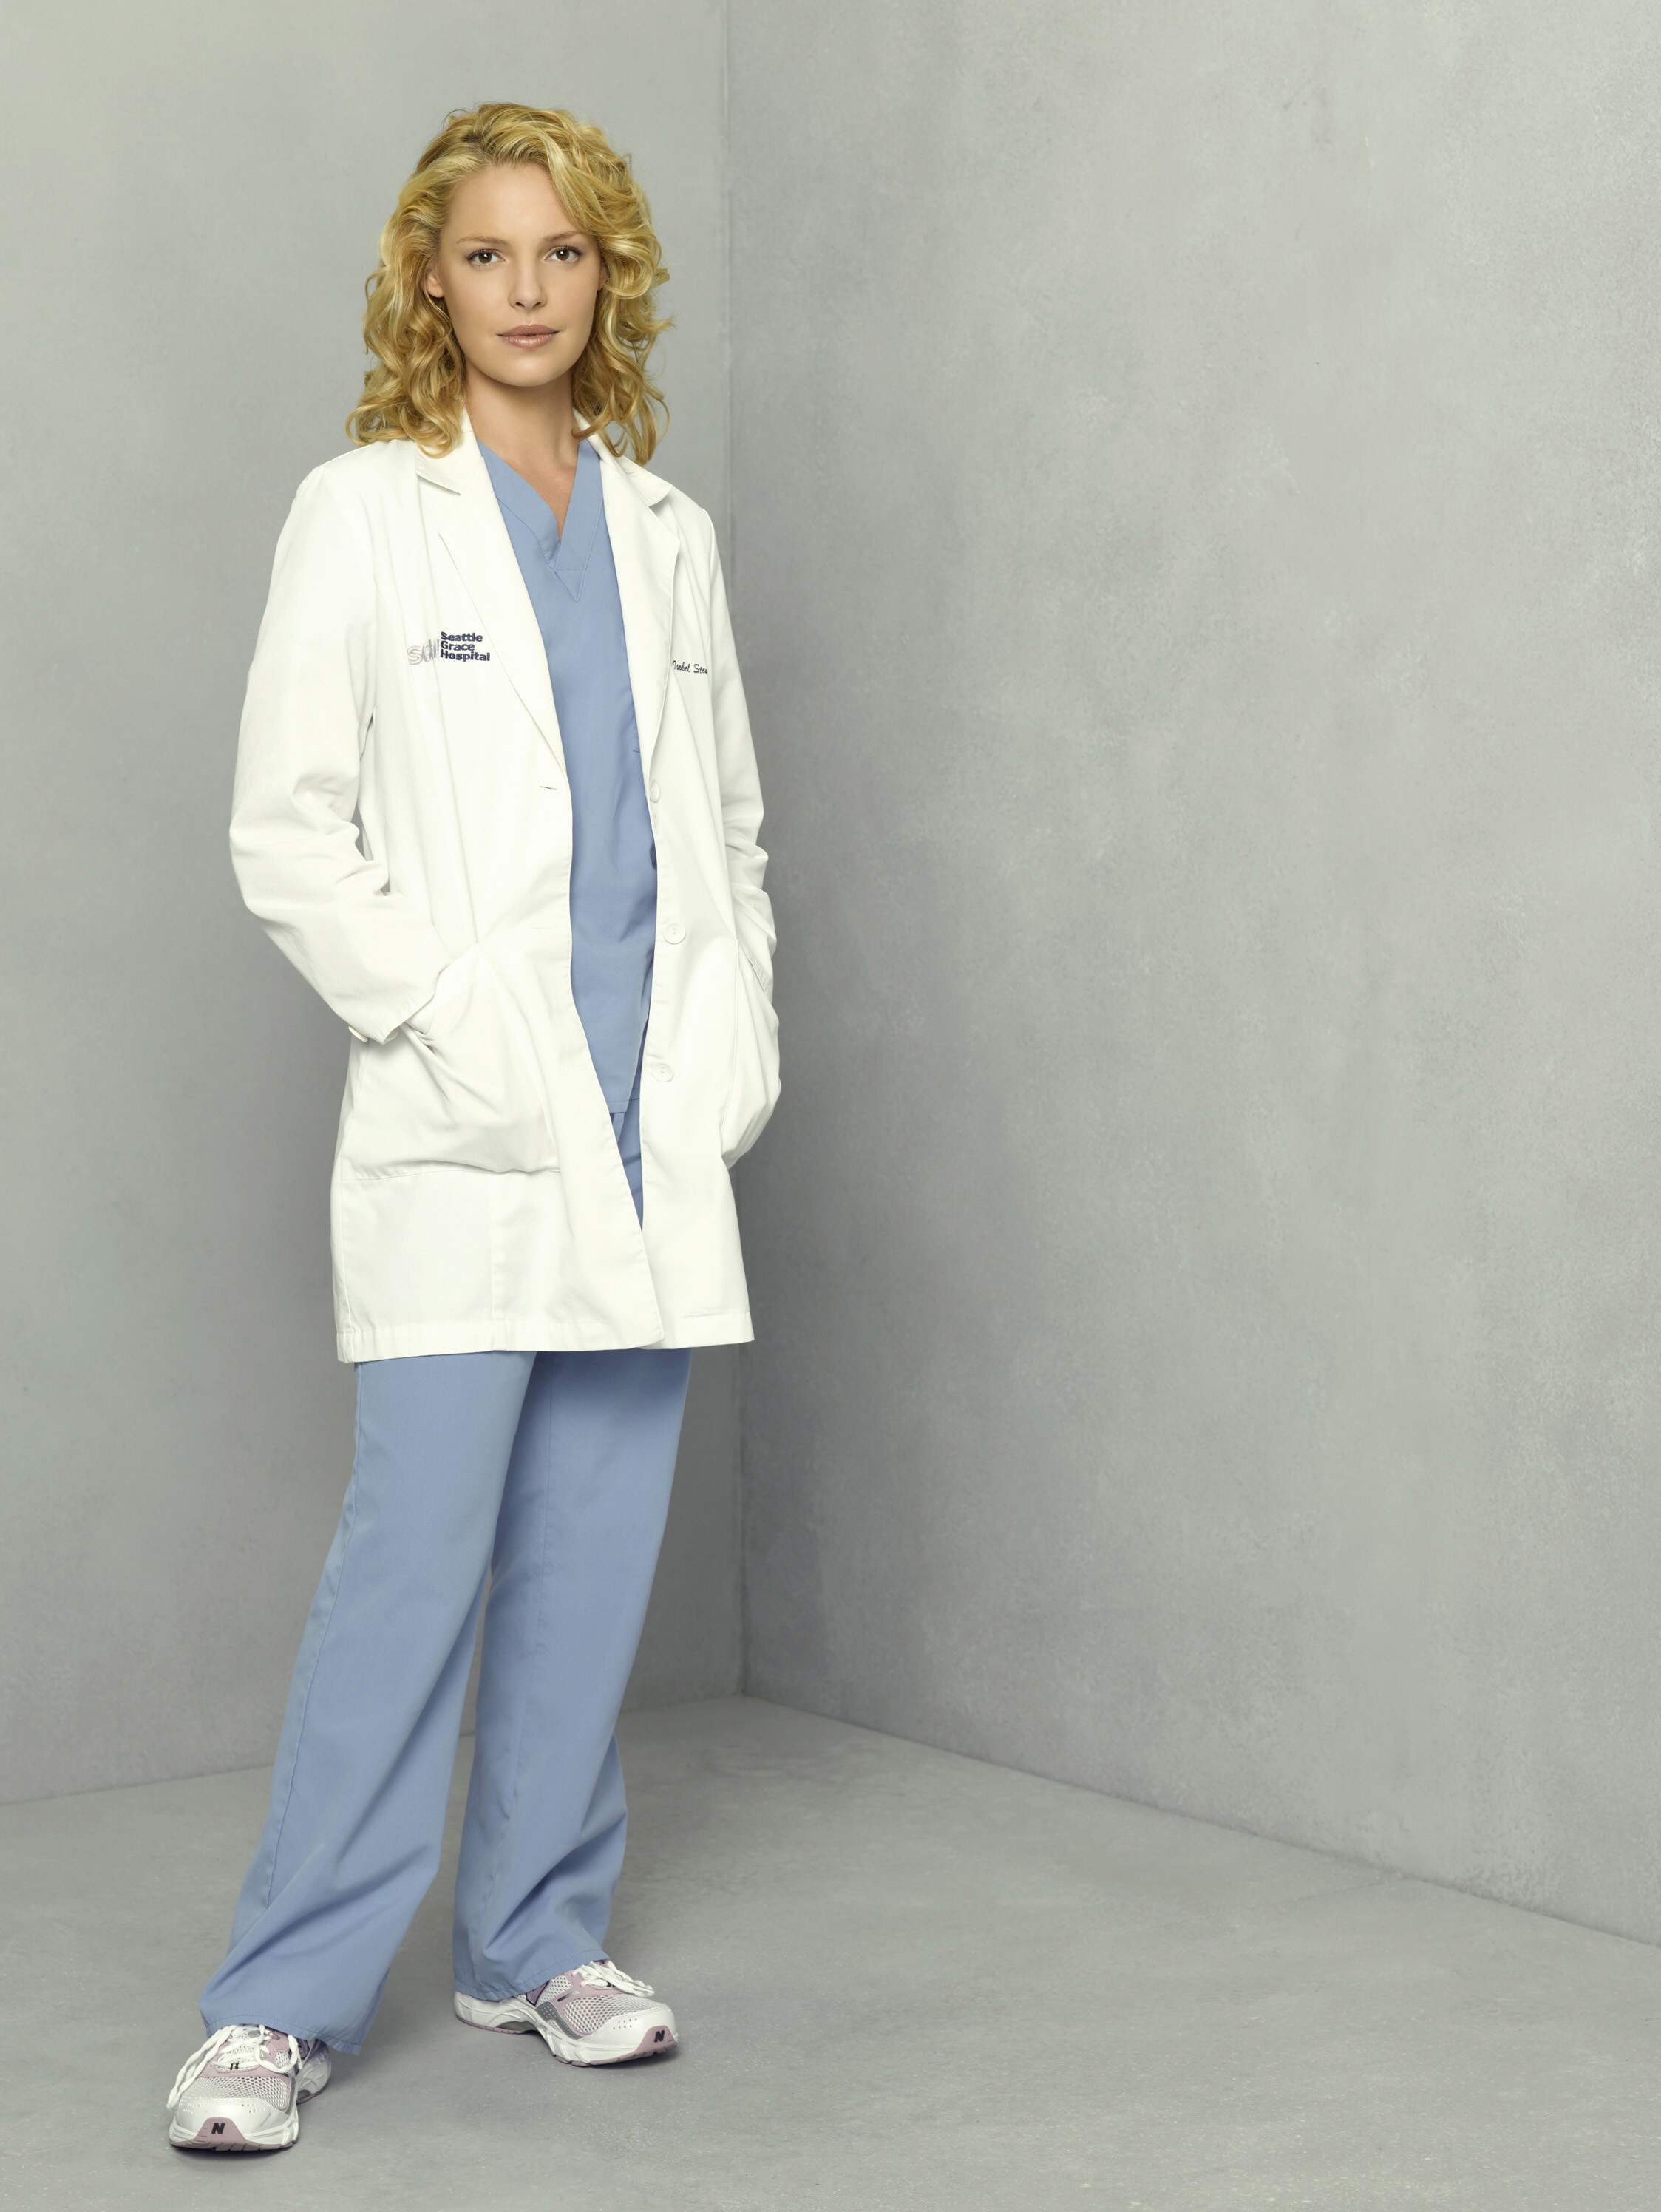 No. 11: Dr. Izzie Stevens